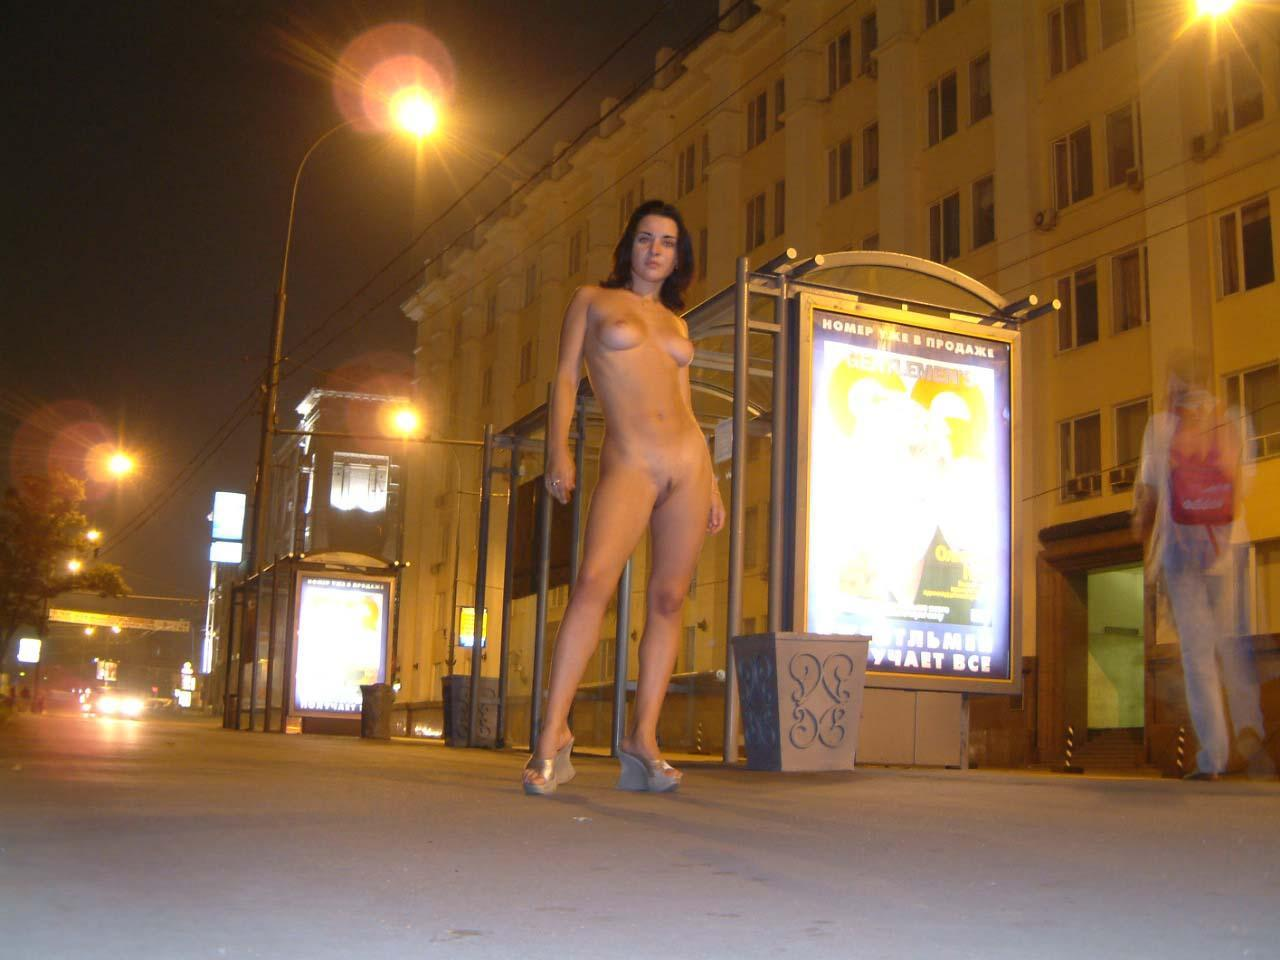 golie-moskovskie-zhenshini-risovat-sharzh